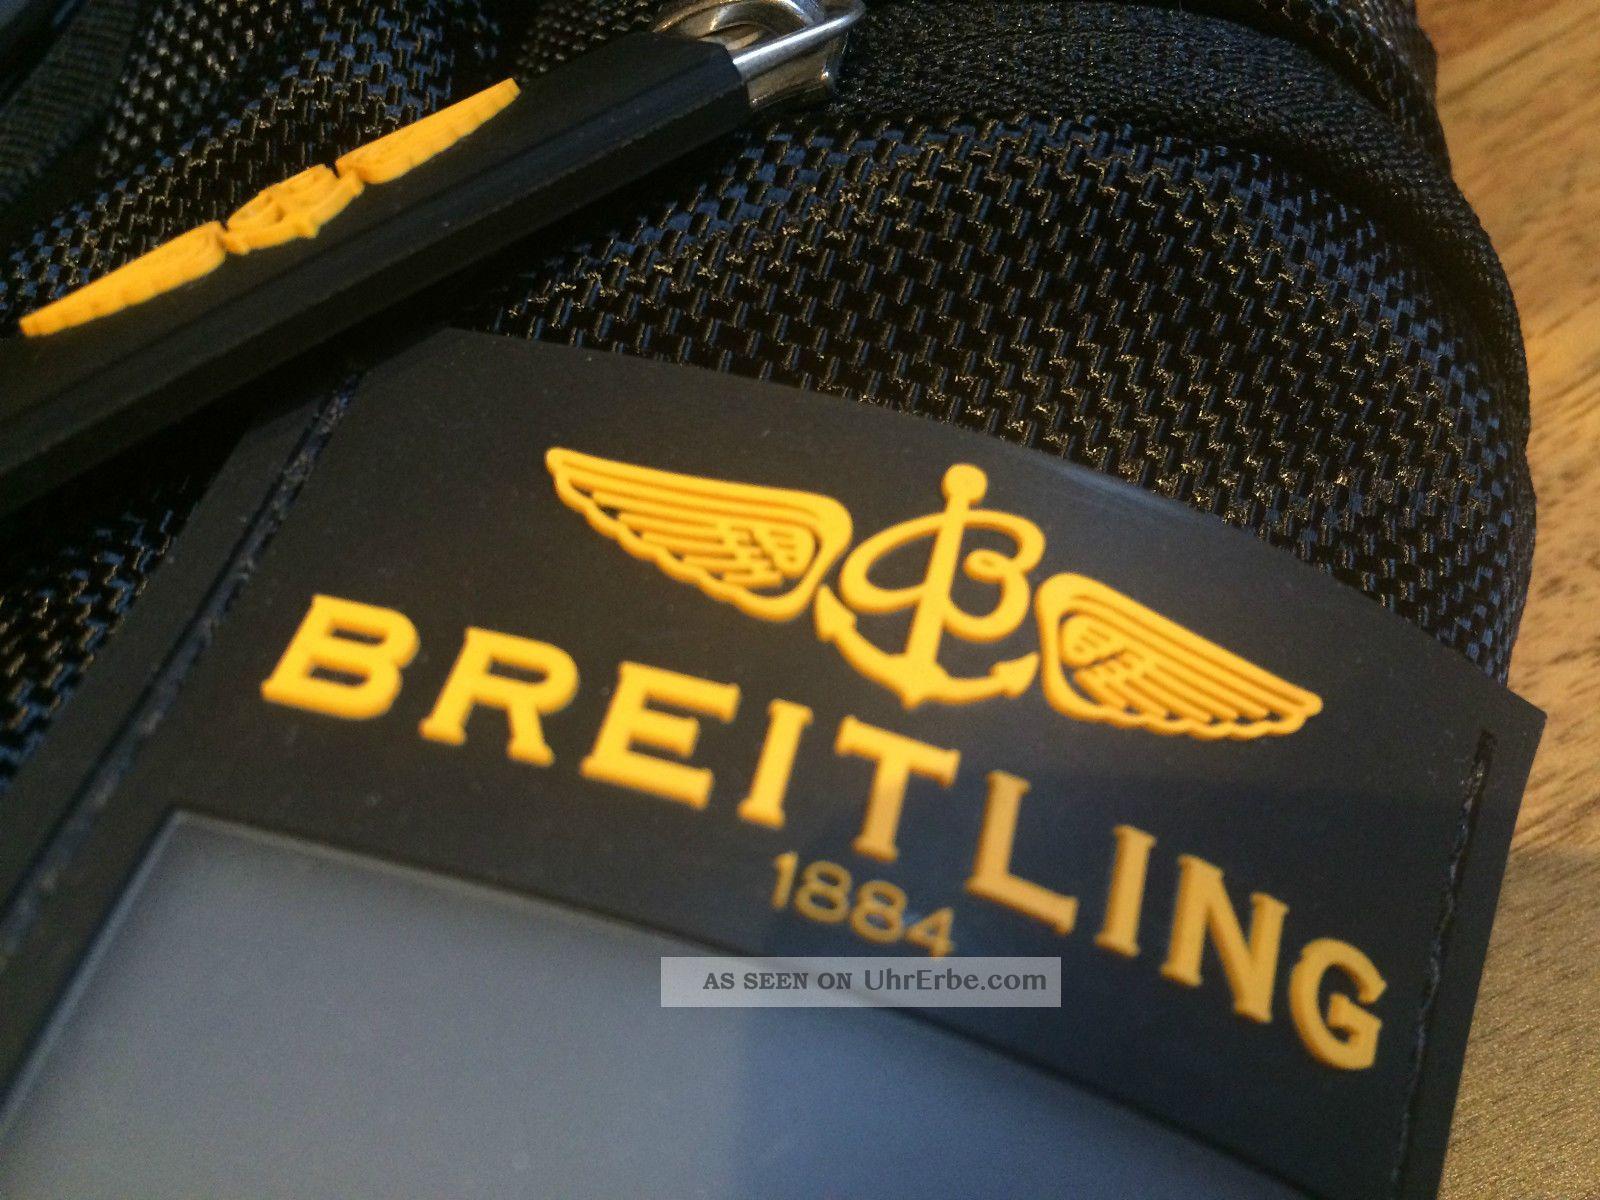 Breitling Rucksack Armbanduhren Bild